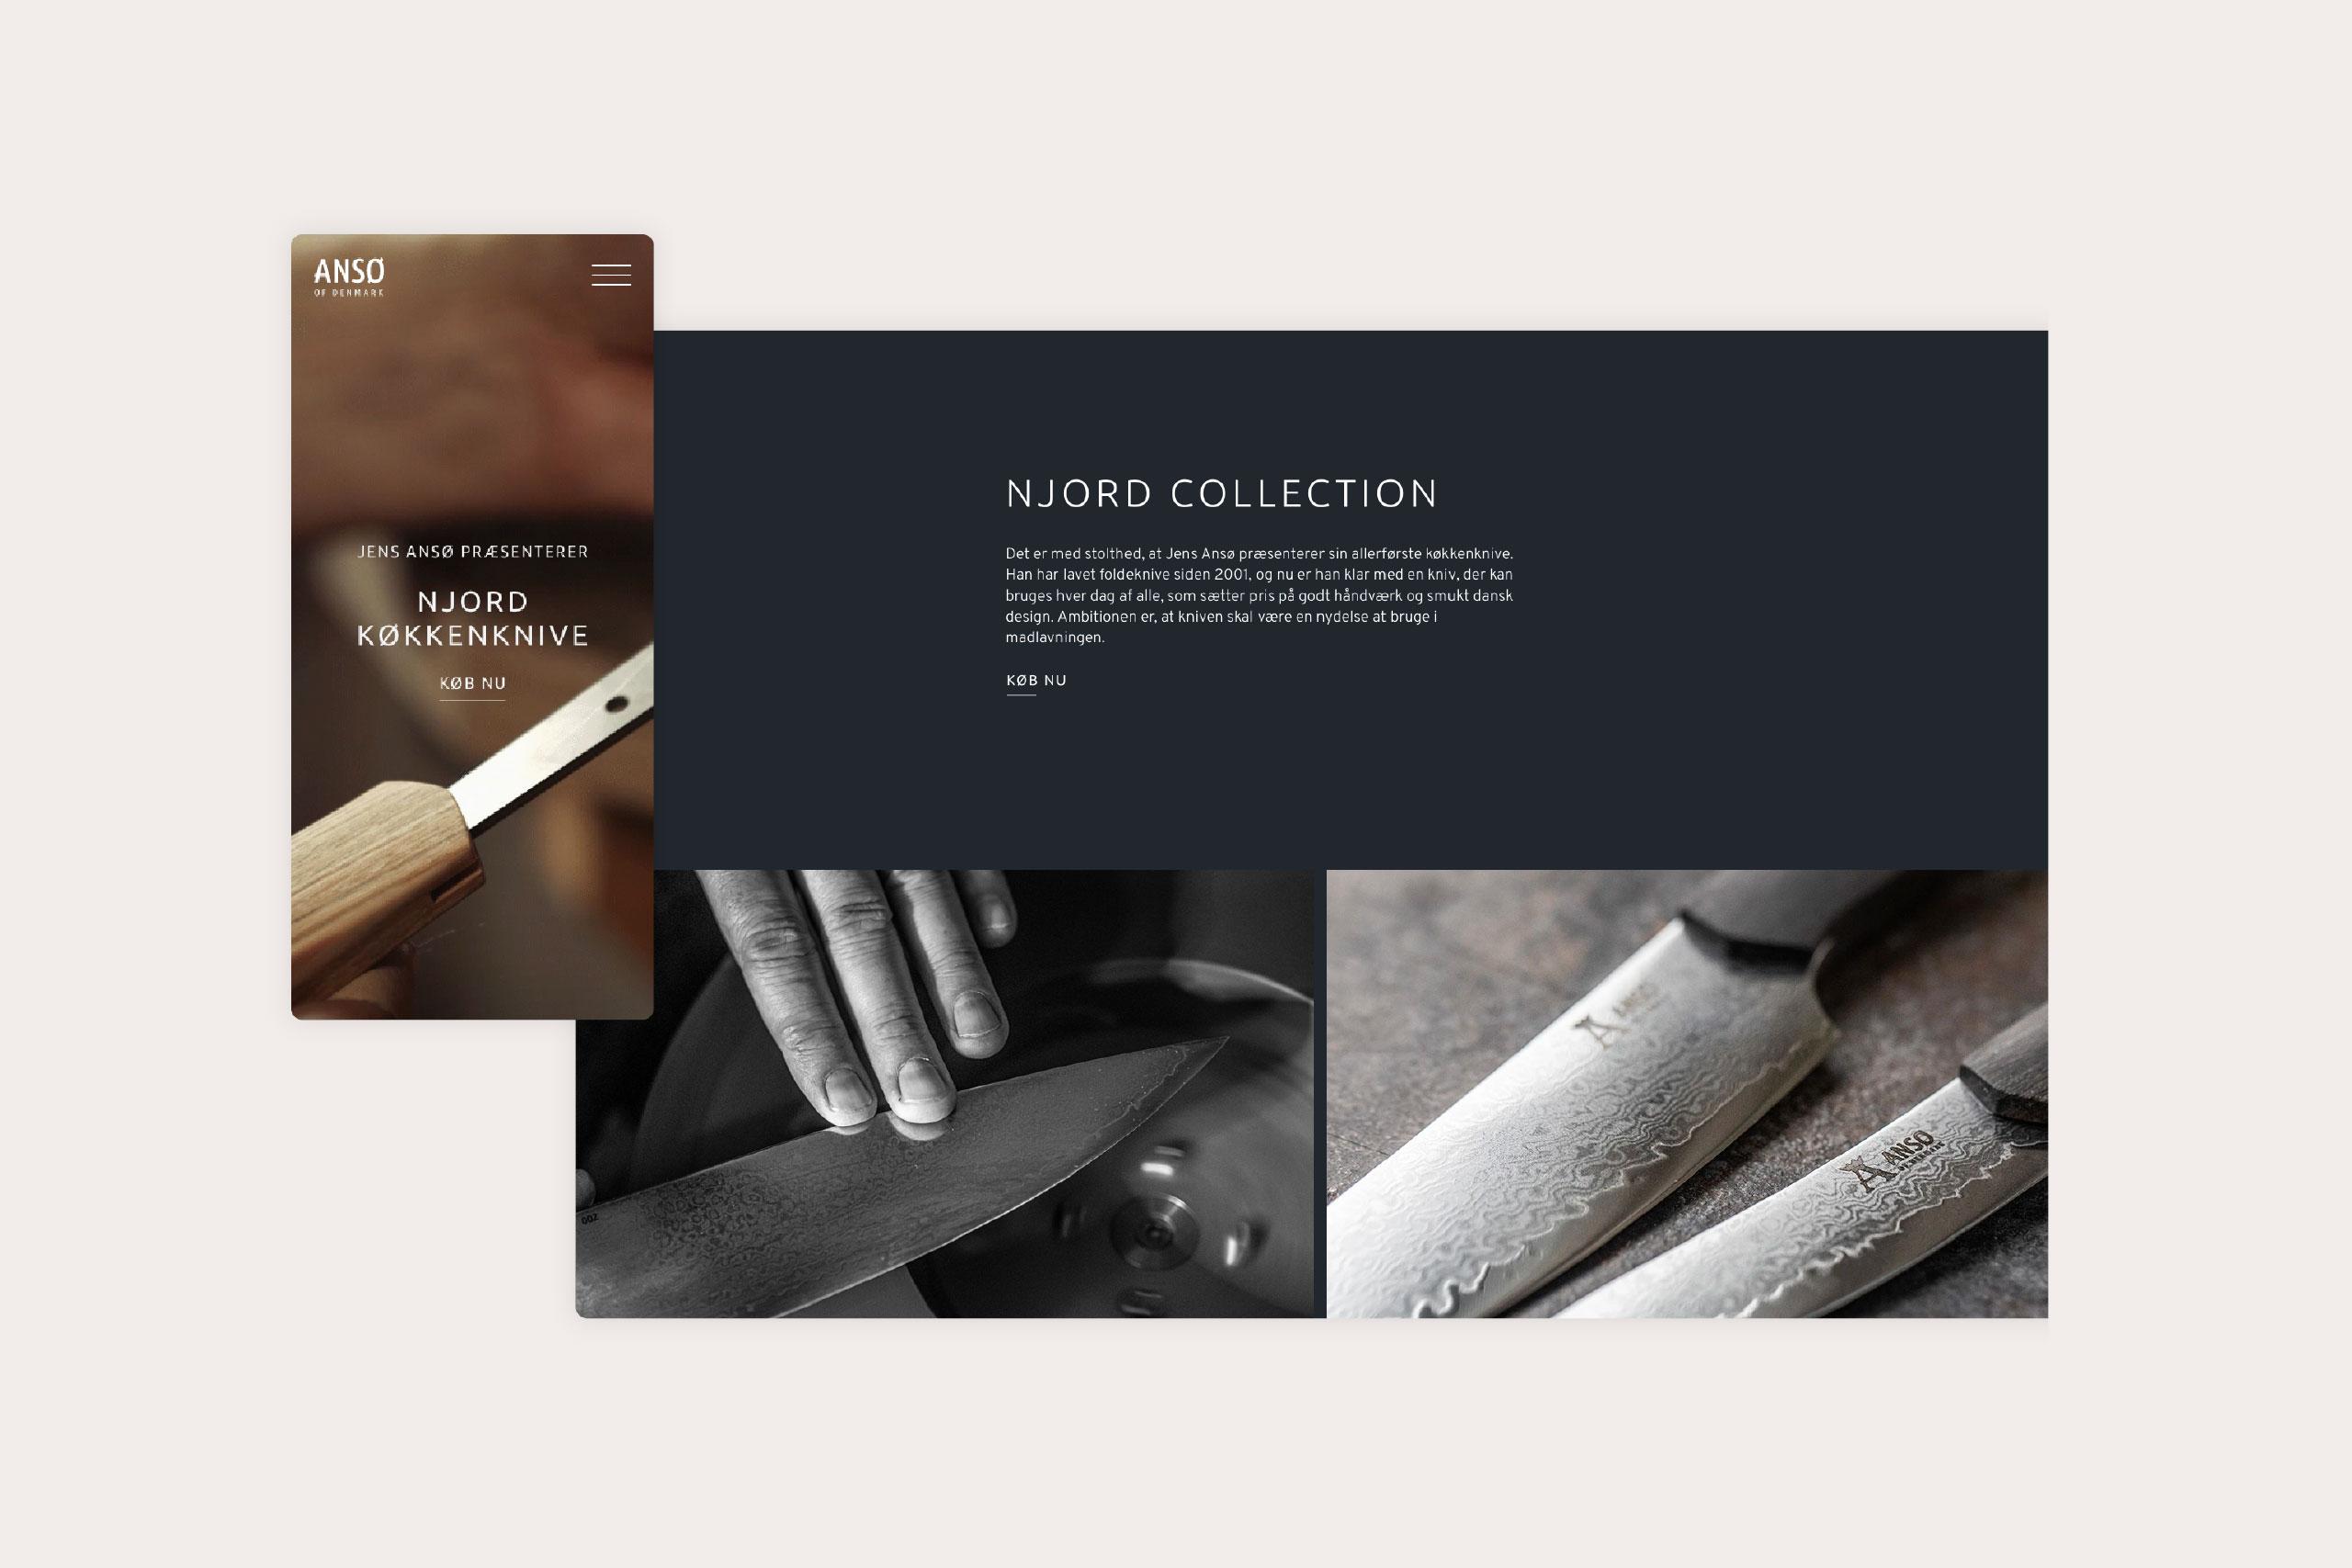 Website selling kitchen knives